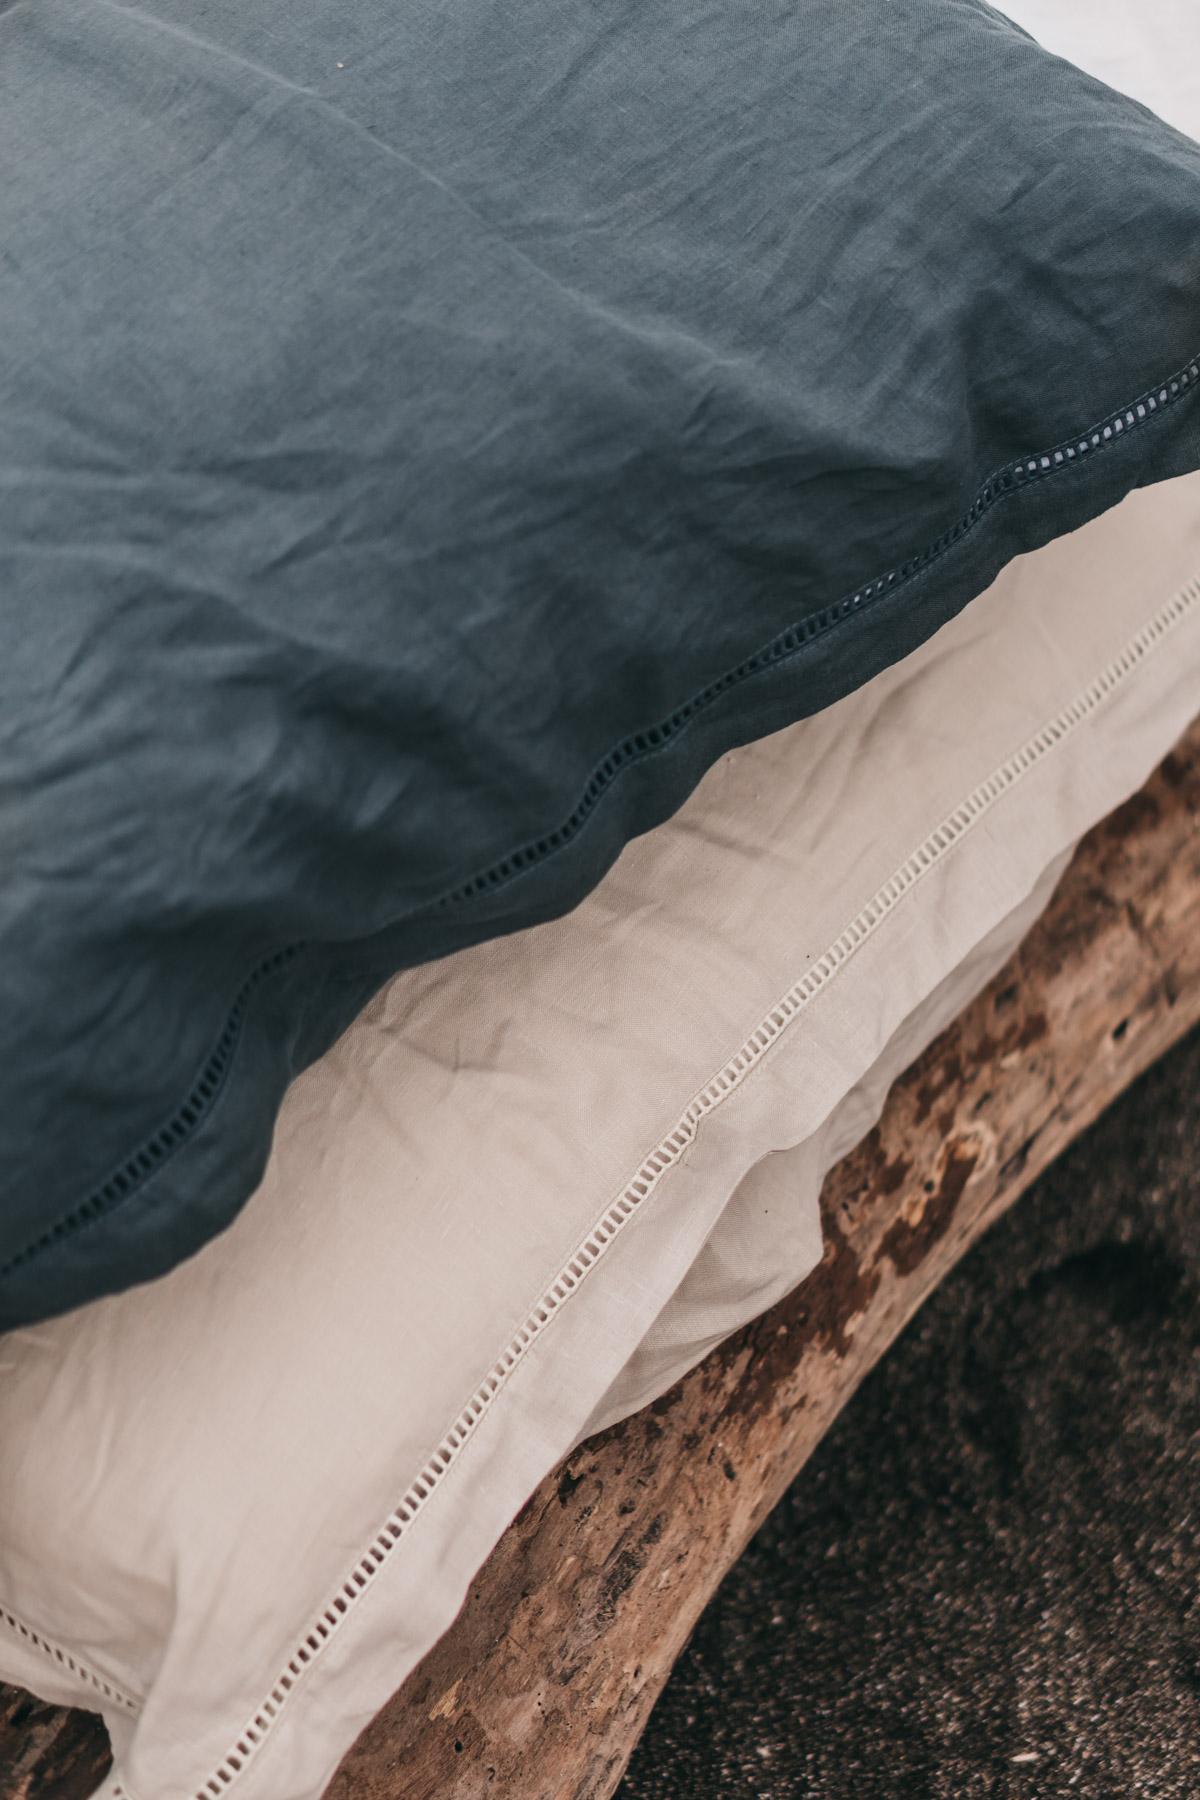 Keira-Mason-in-between-the-sheets-linen-shades.jpg